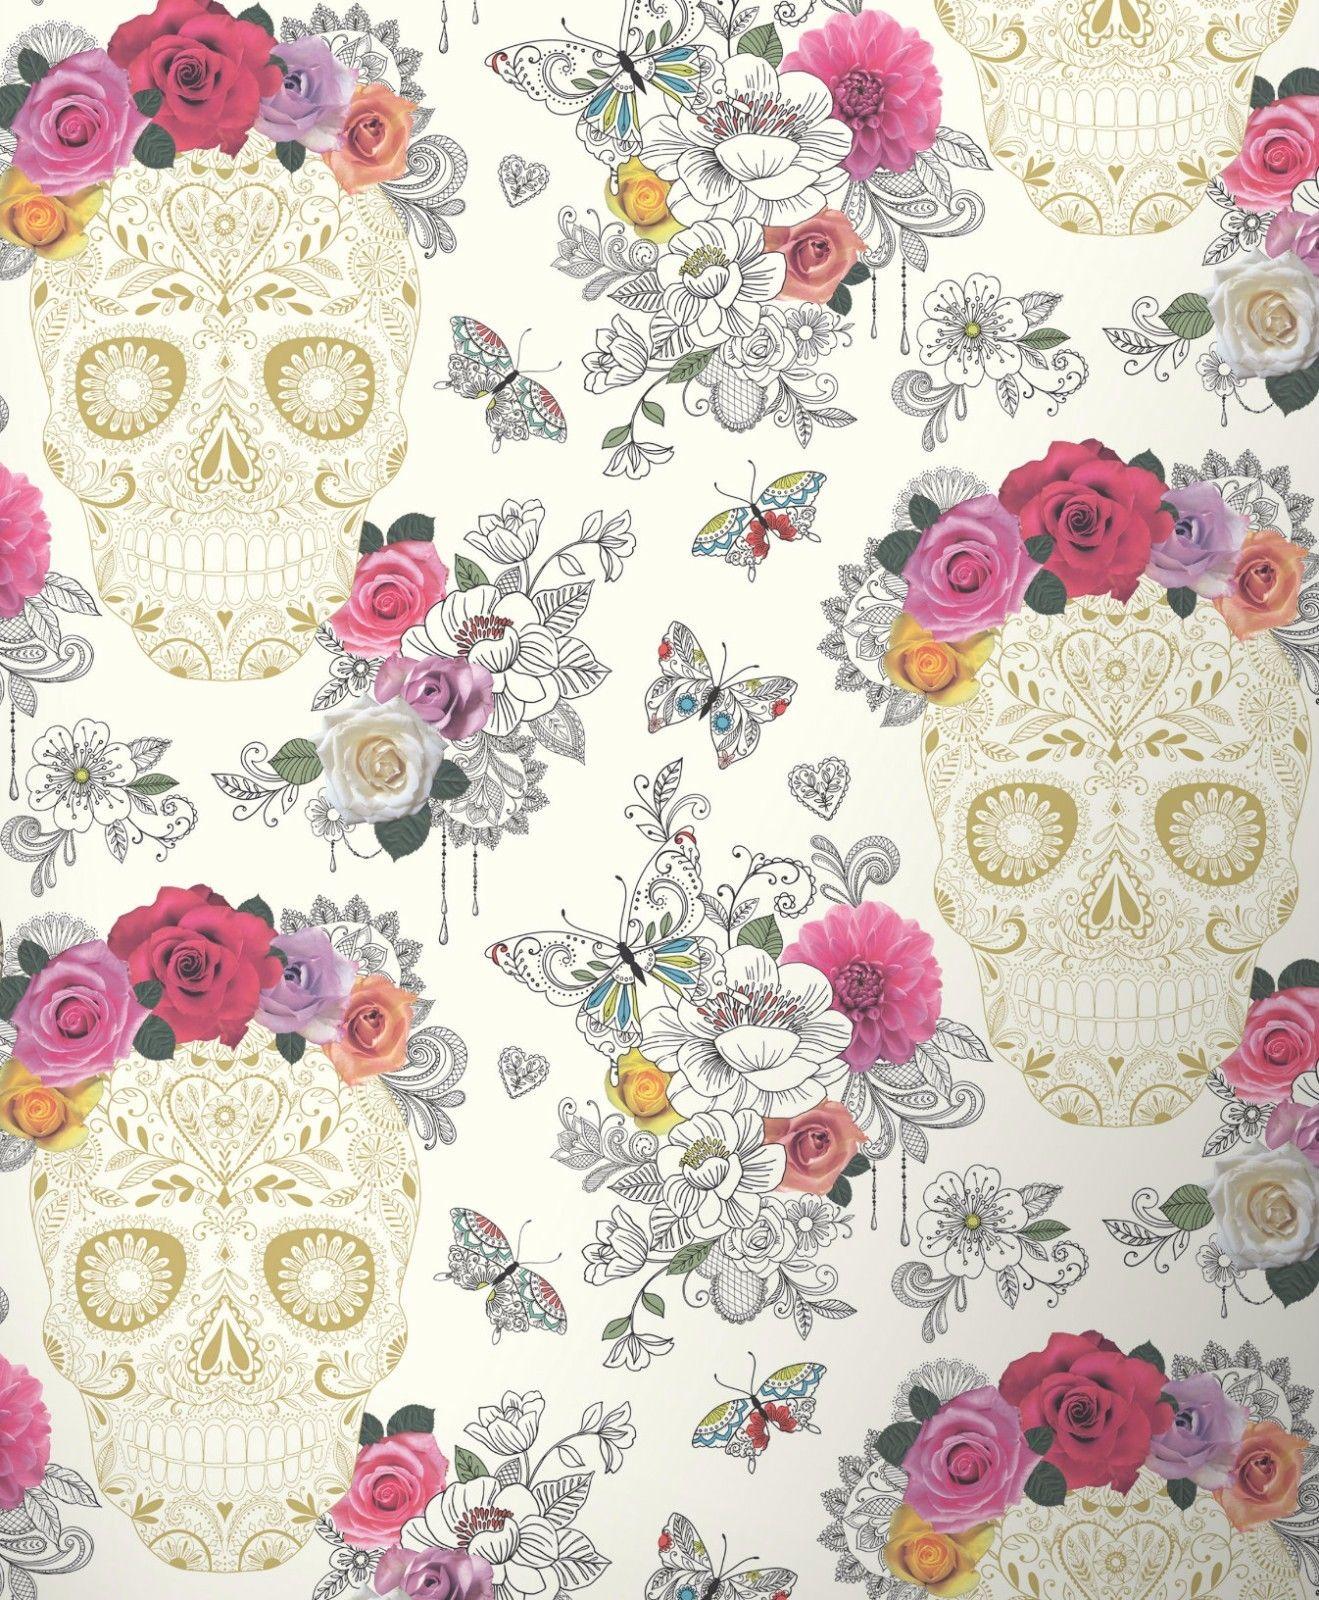 Flower Skull Floral Wallpaper Butterflies Art Hearts Roses Funky